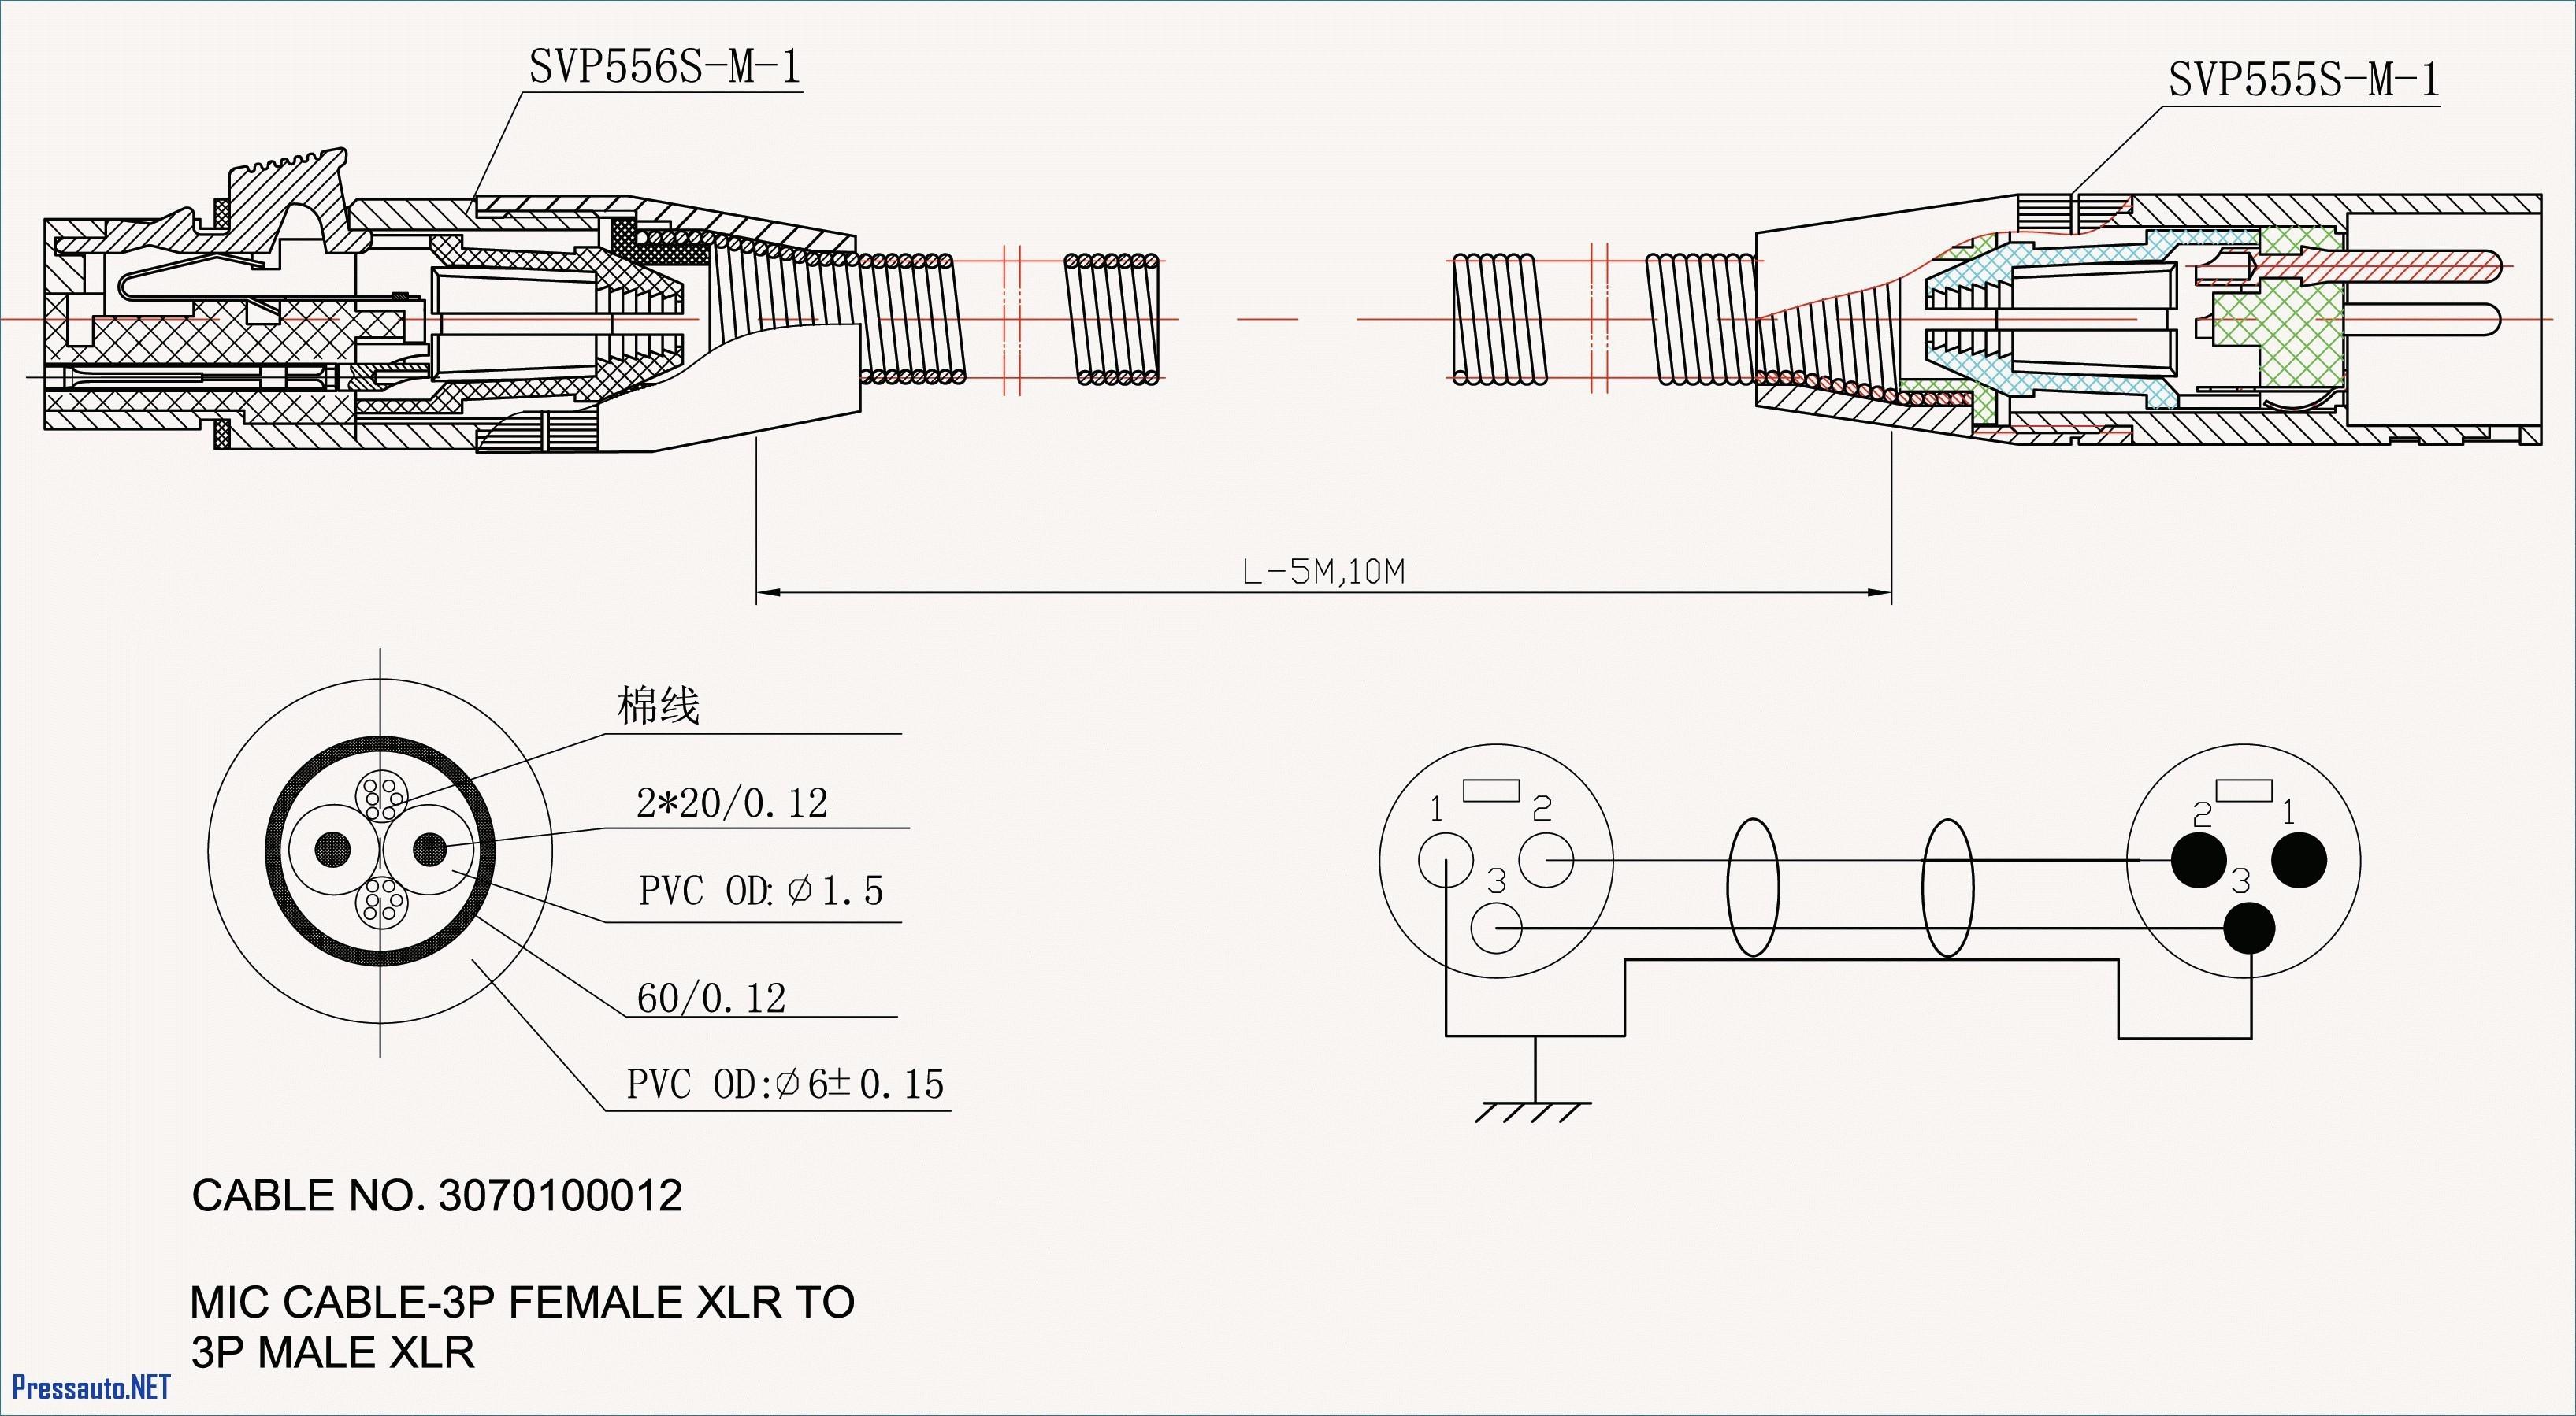 Wiring Prestolite Diagram Alternator 6222y Wiring Diagram Library Prestolite Alternator Wiring Diagram For John Deere 650g